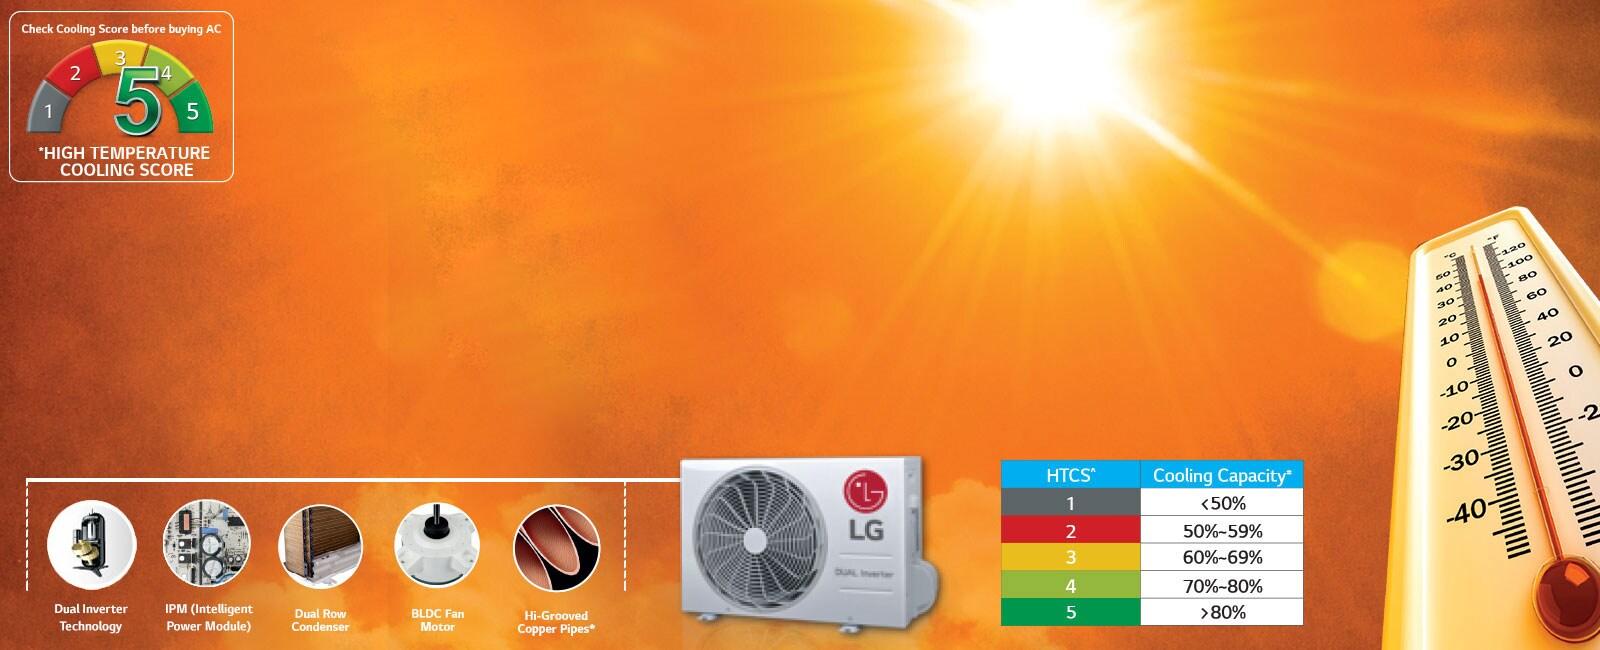 LG LS-Q18BNZD High Temperature Cooling Score